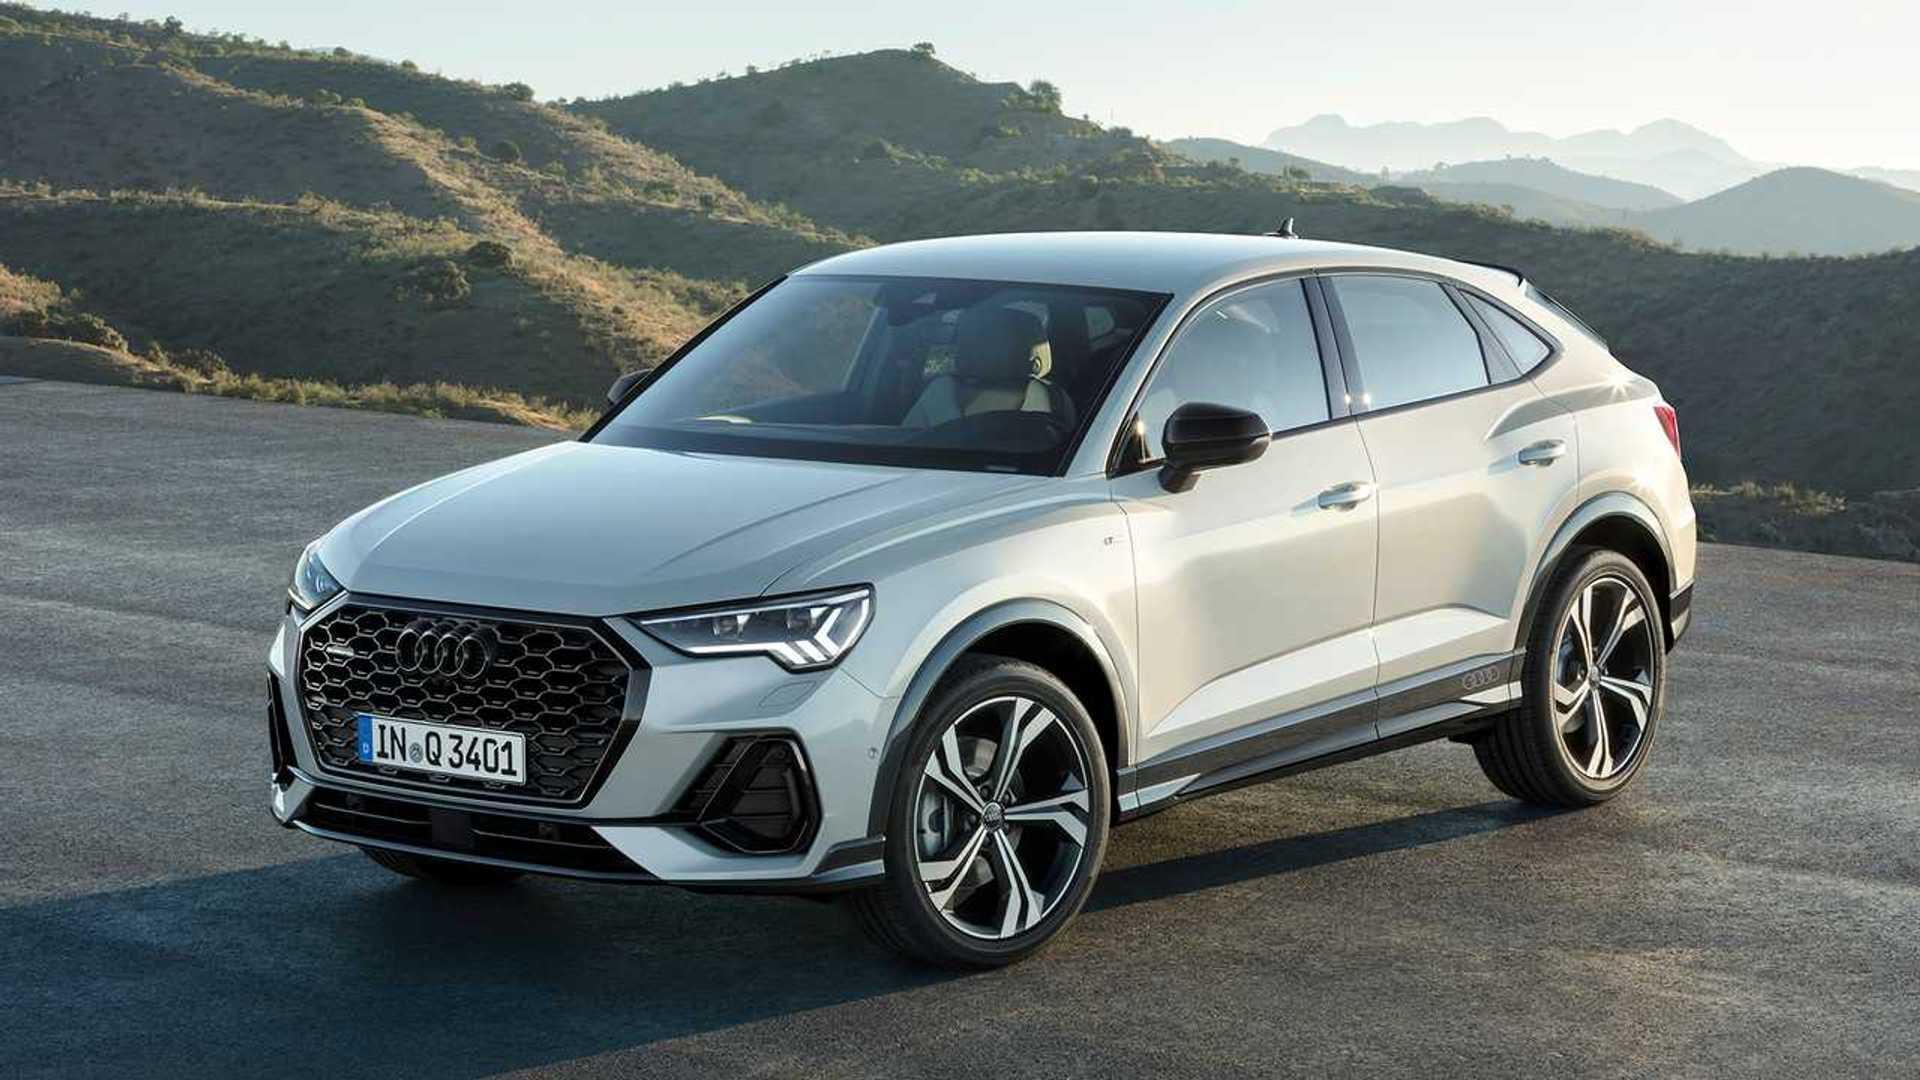 2019 - [Audi] Q3 Sportback - Page 4 Audi-q3-sportback-2019